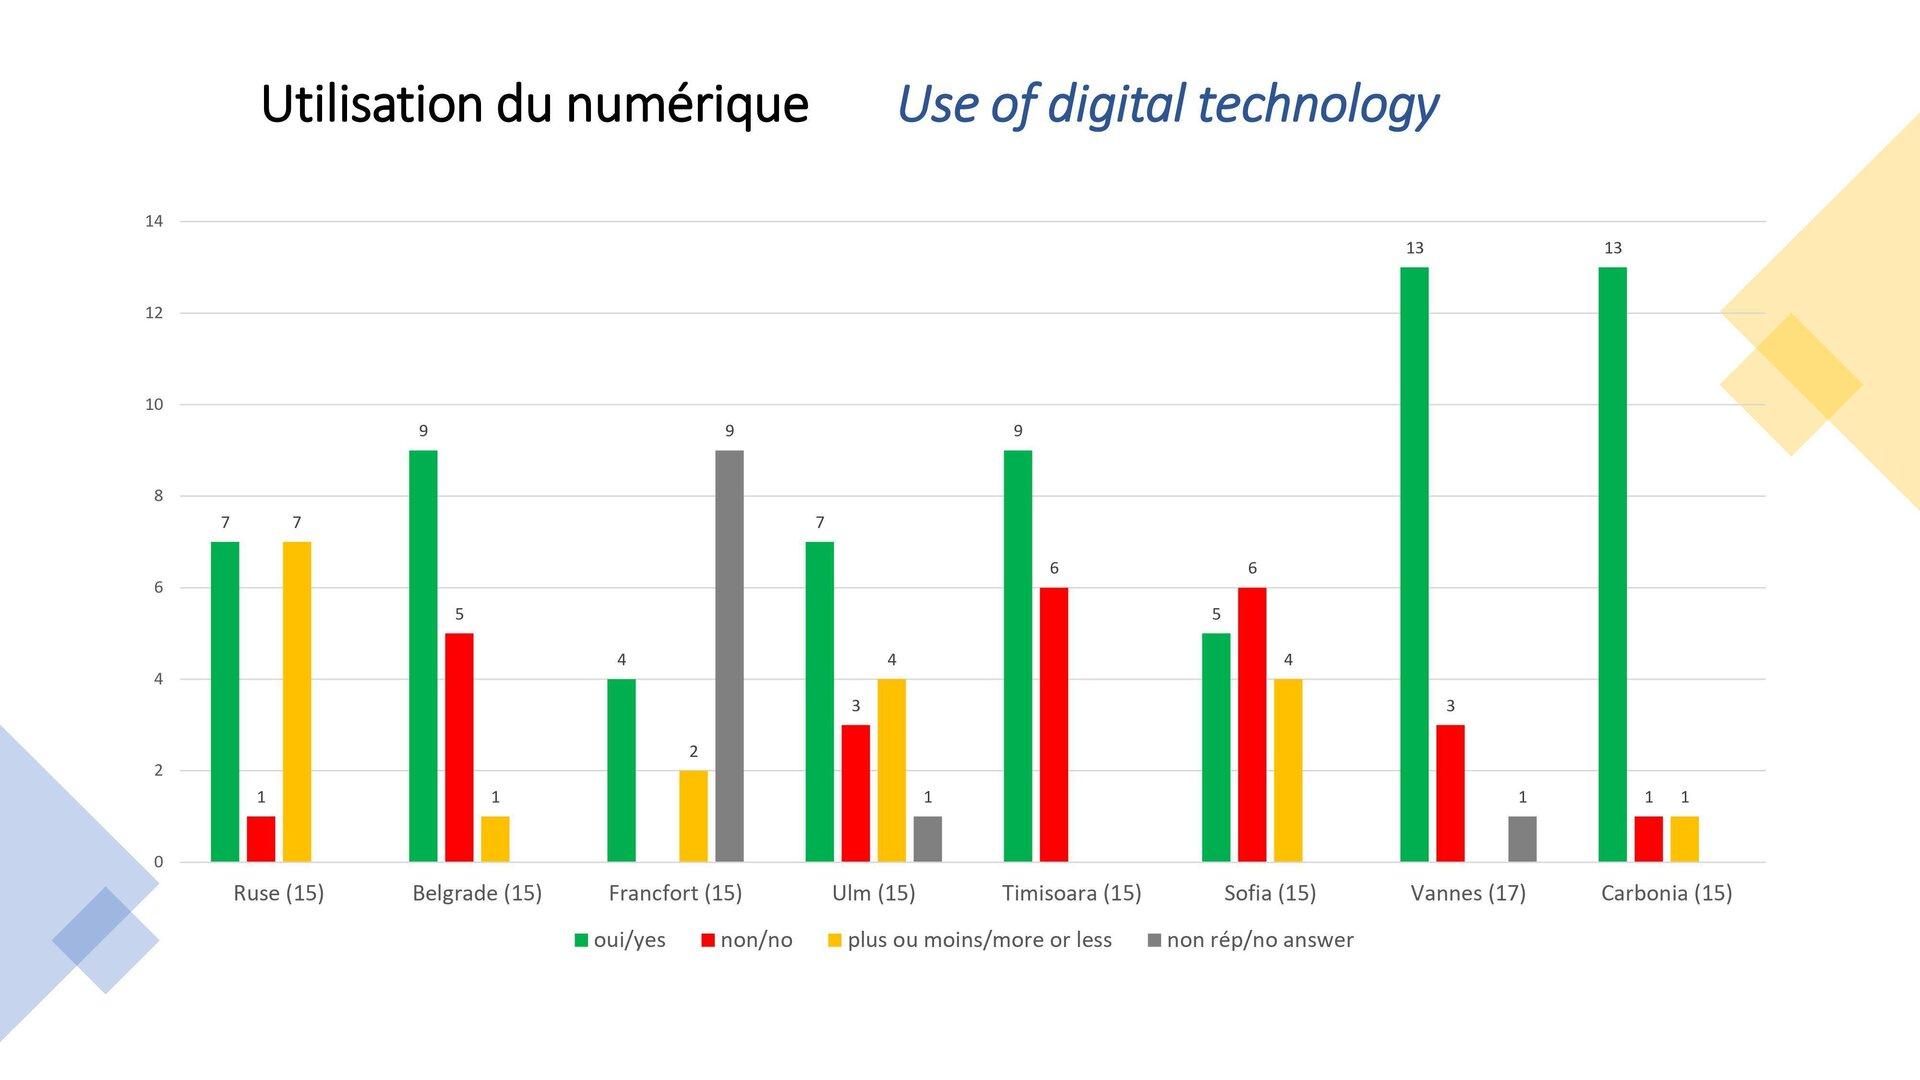 Use of digital technology